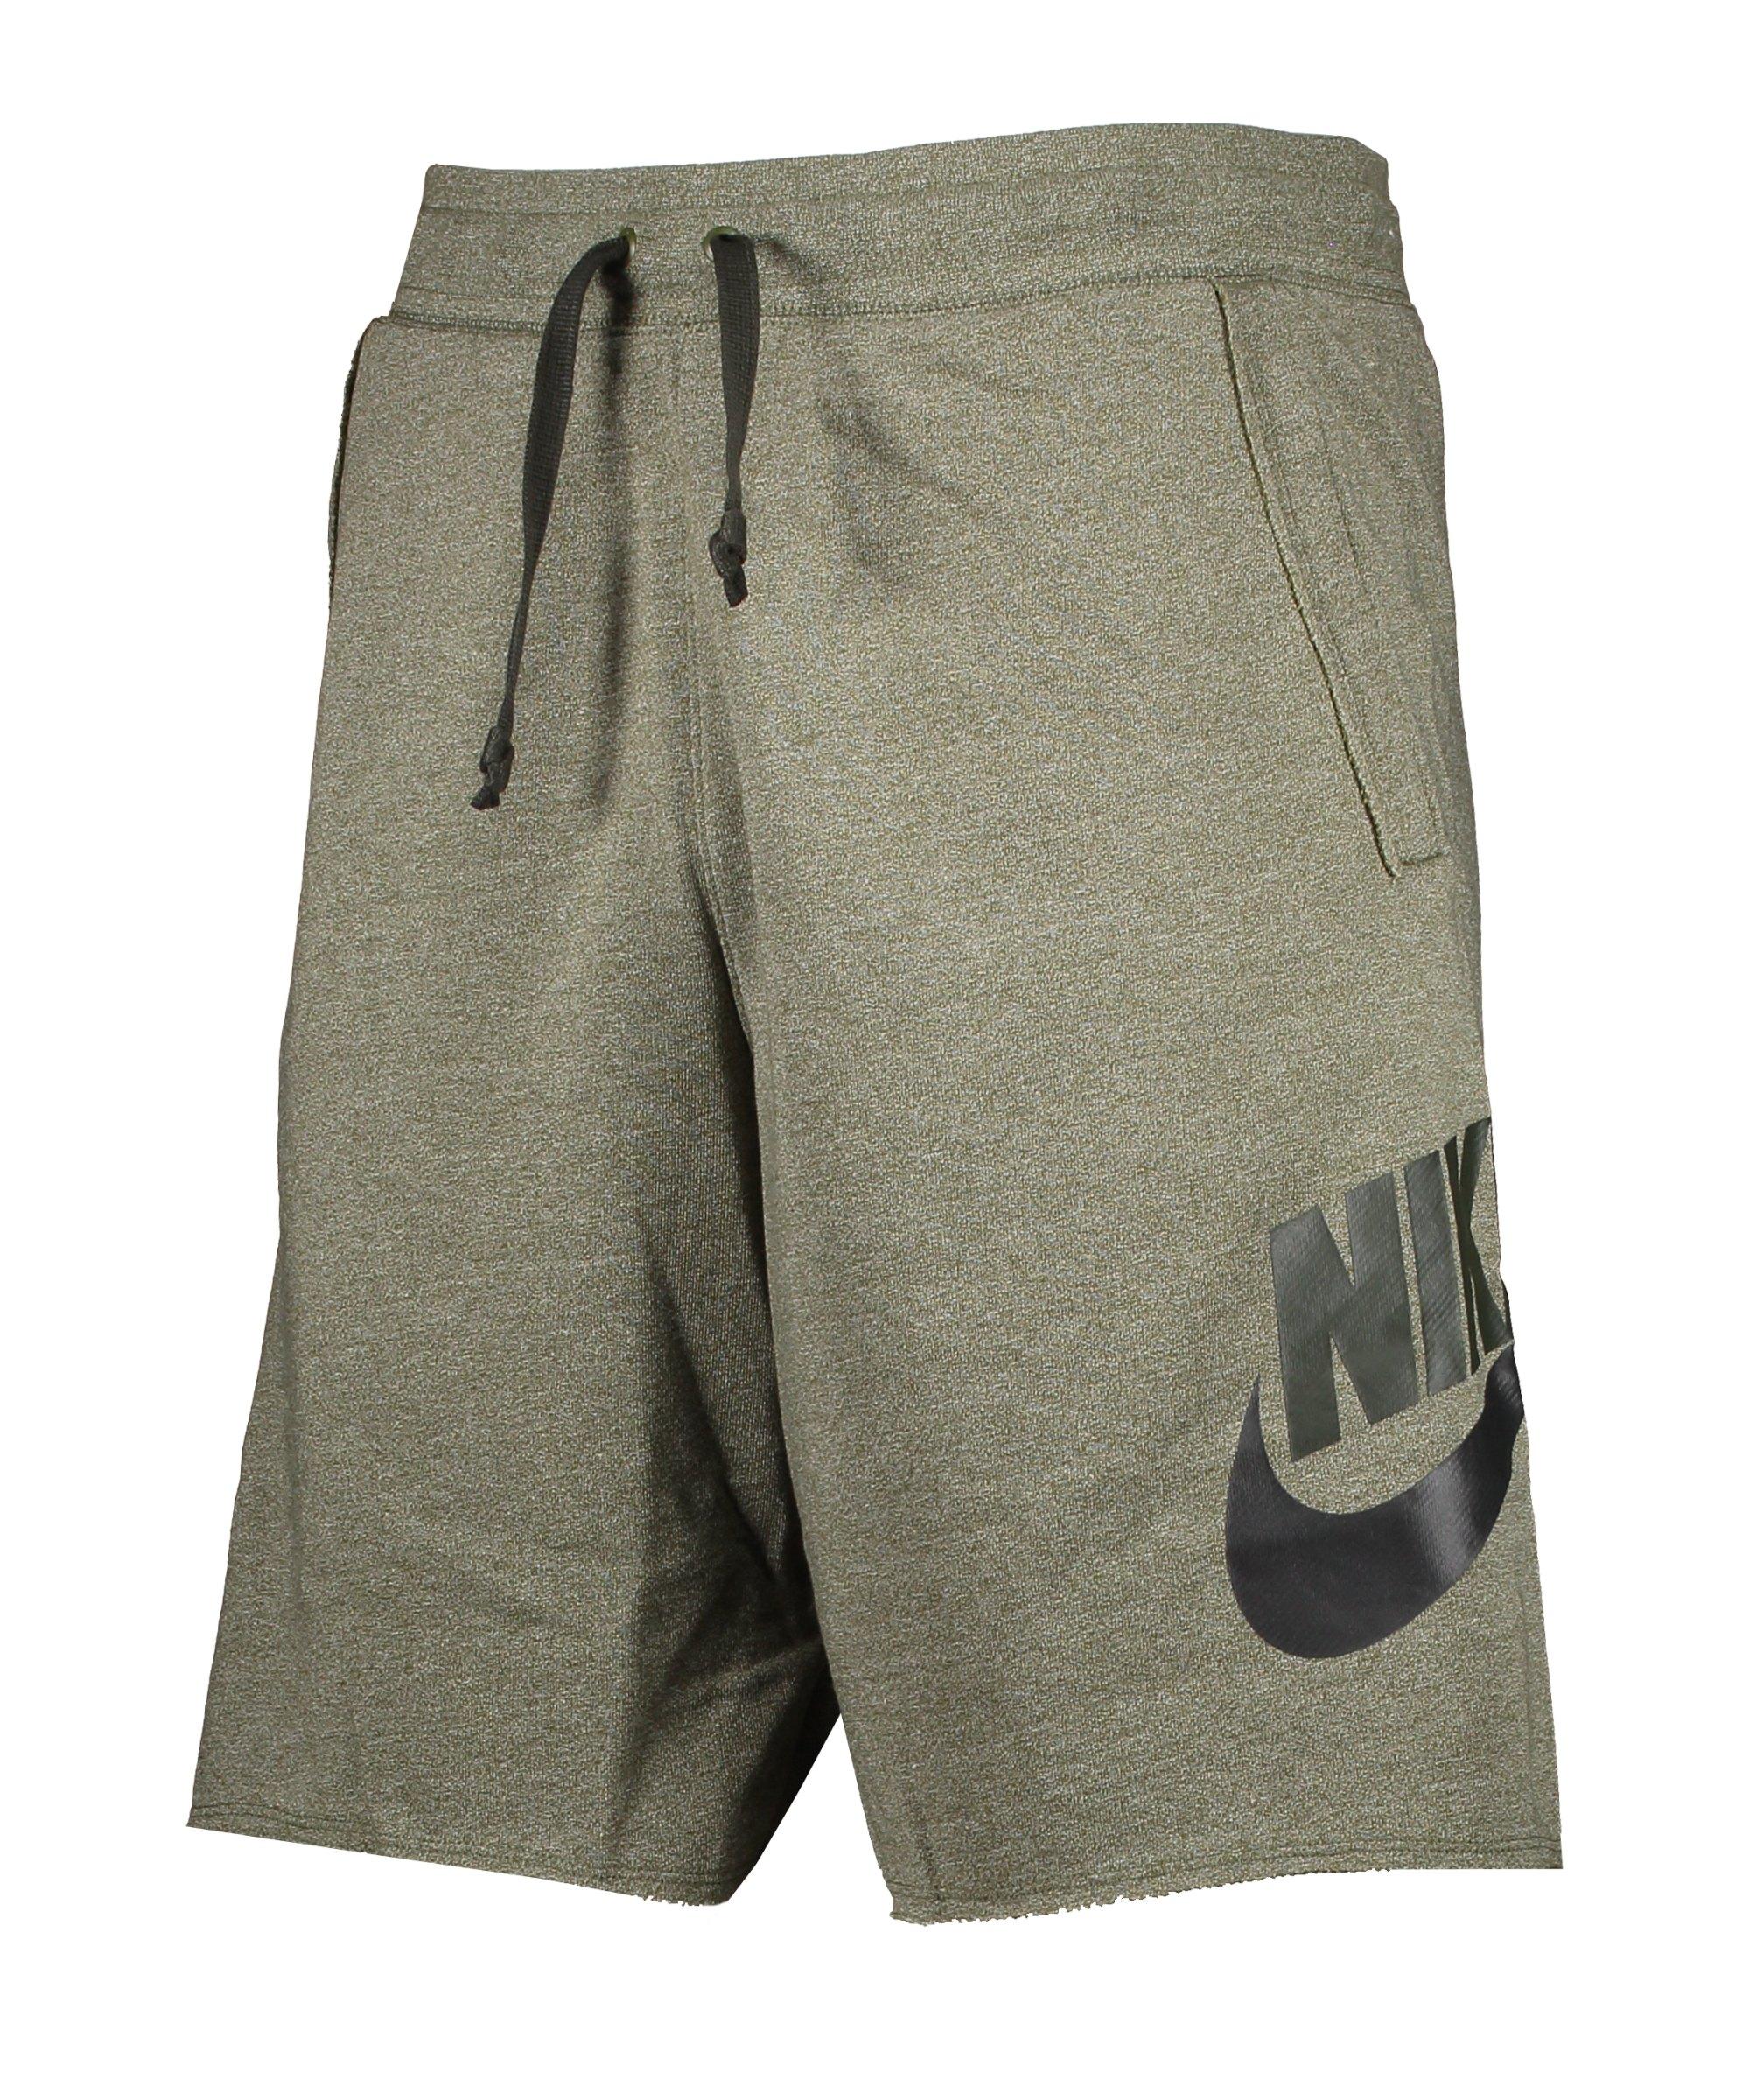 Nike Sportswear Alumni Short Grün F326 - gruen